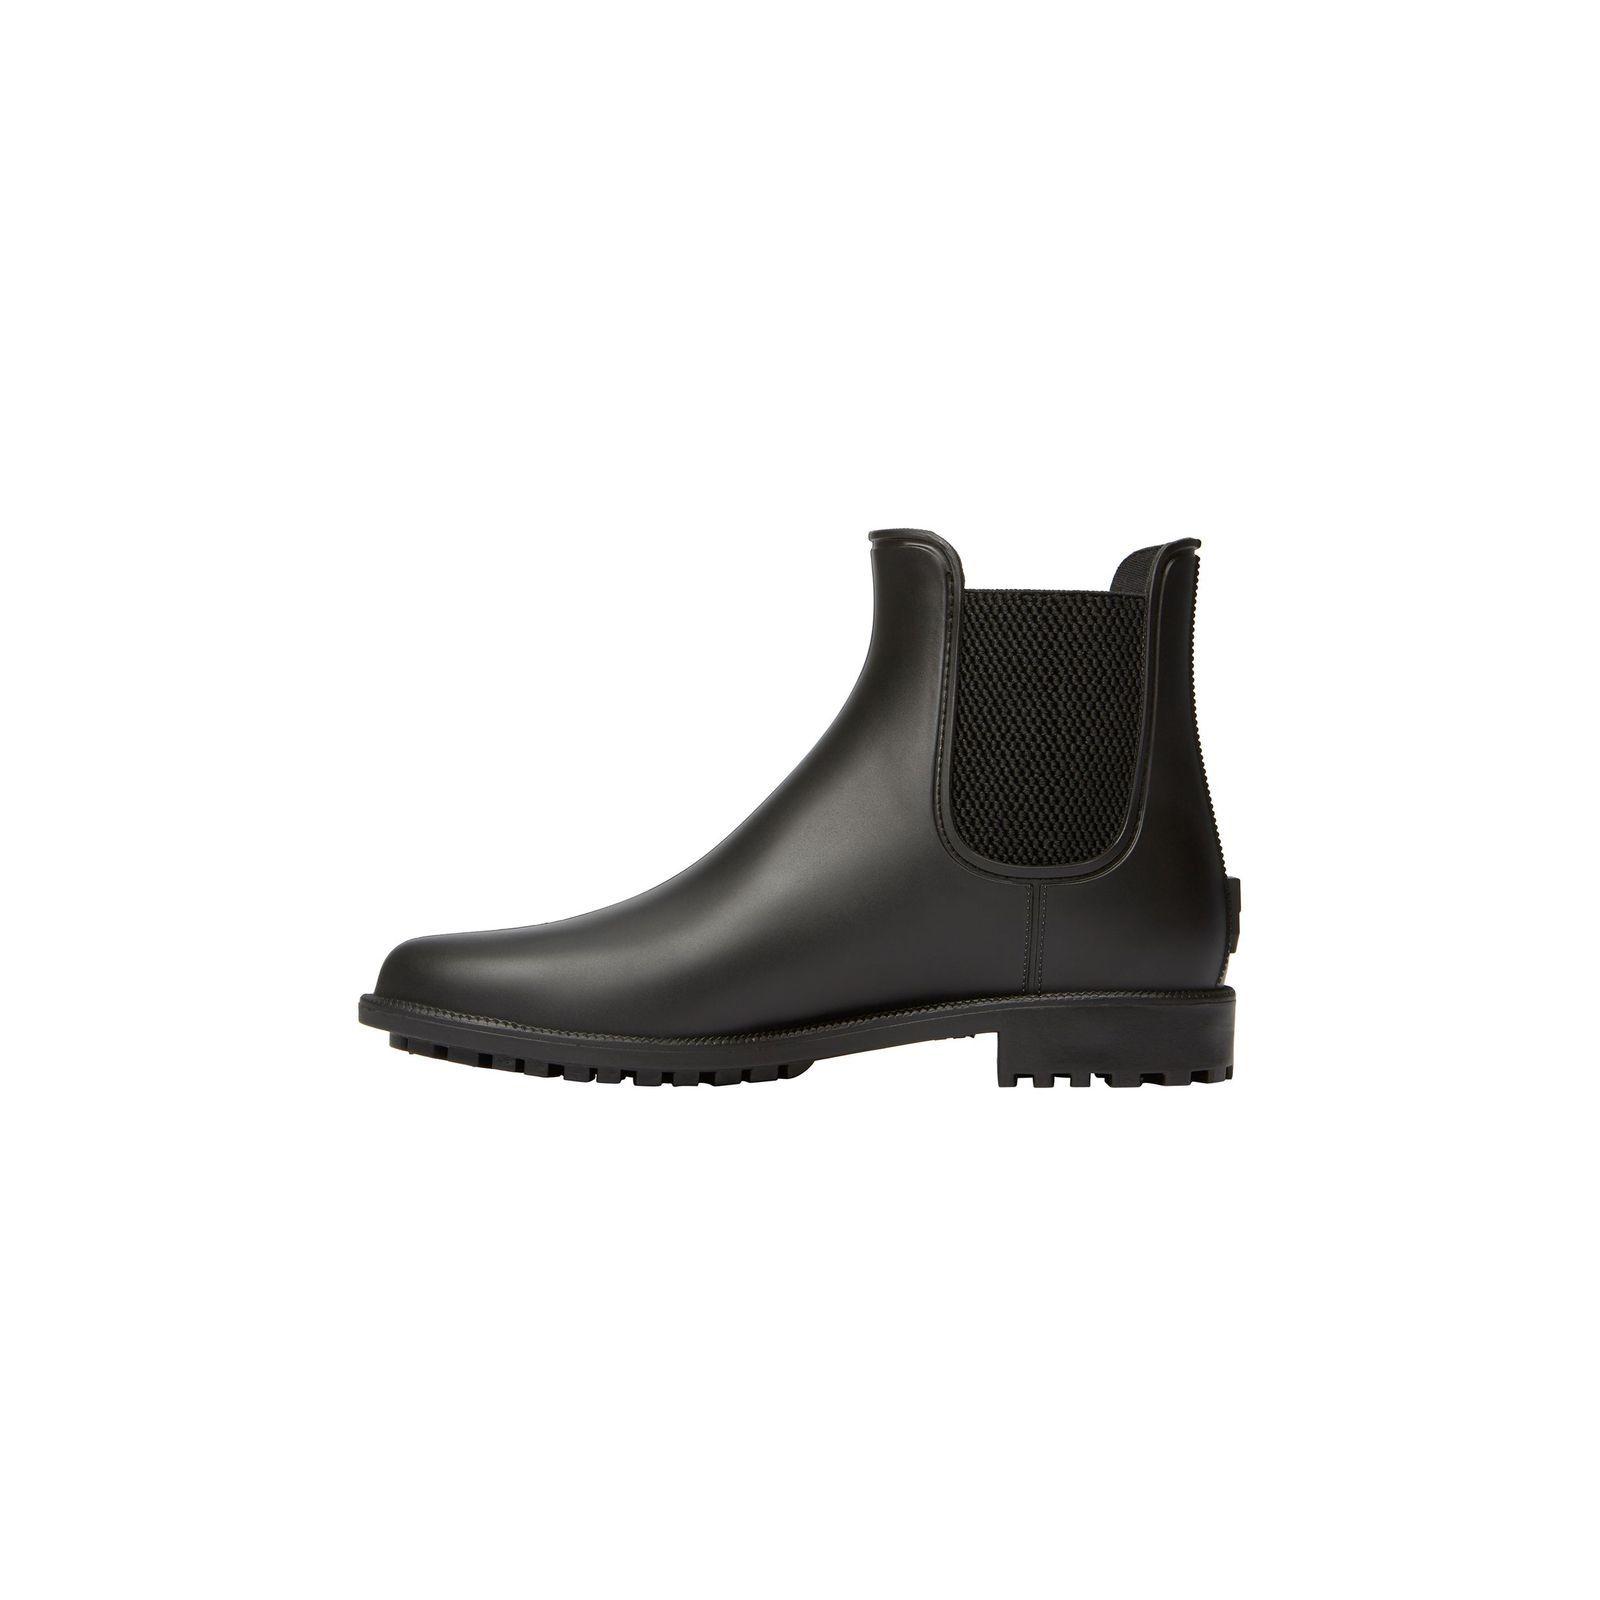 Black boots women, Boots